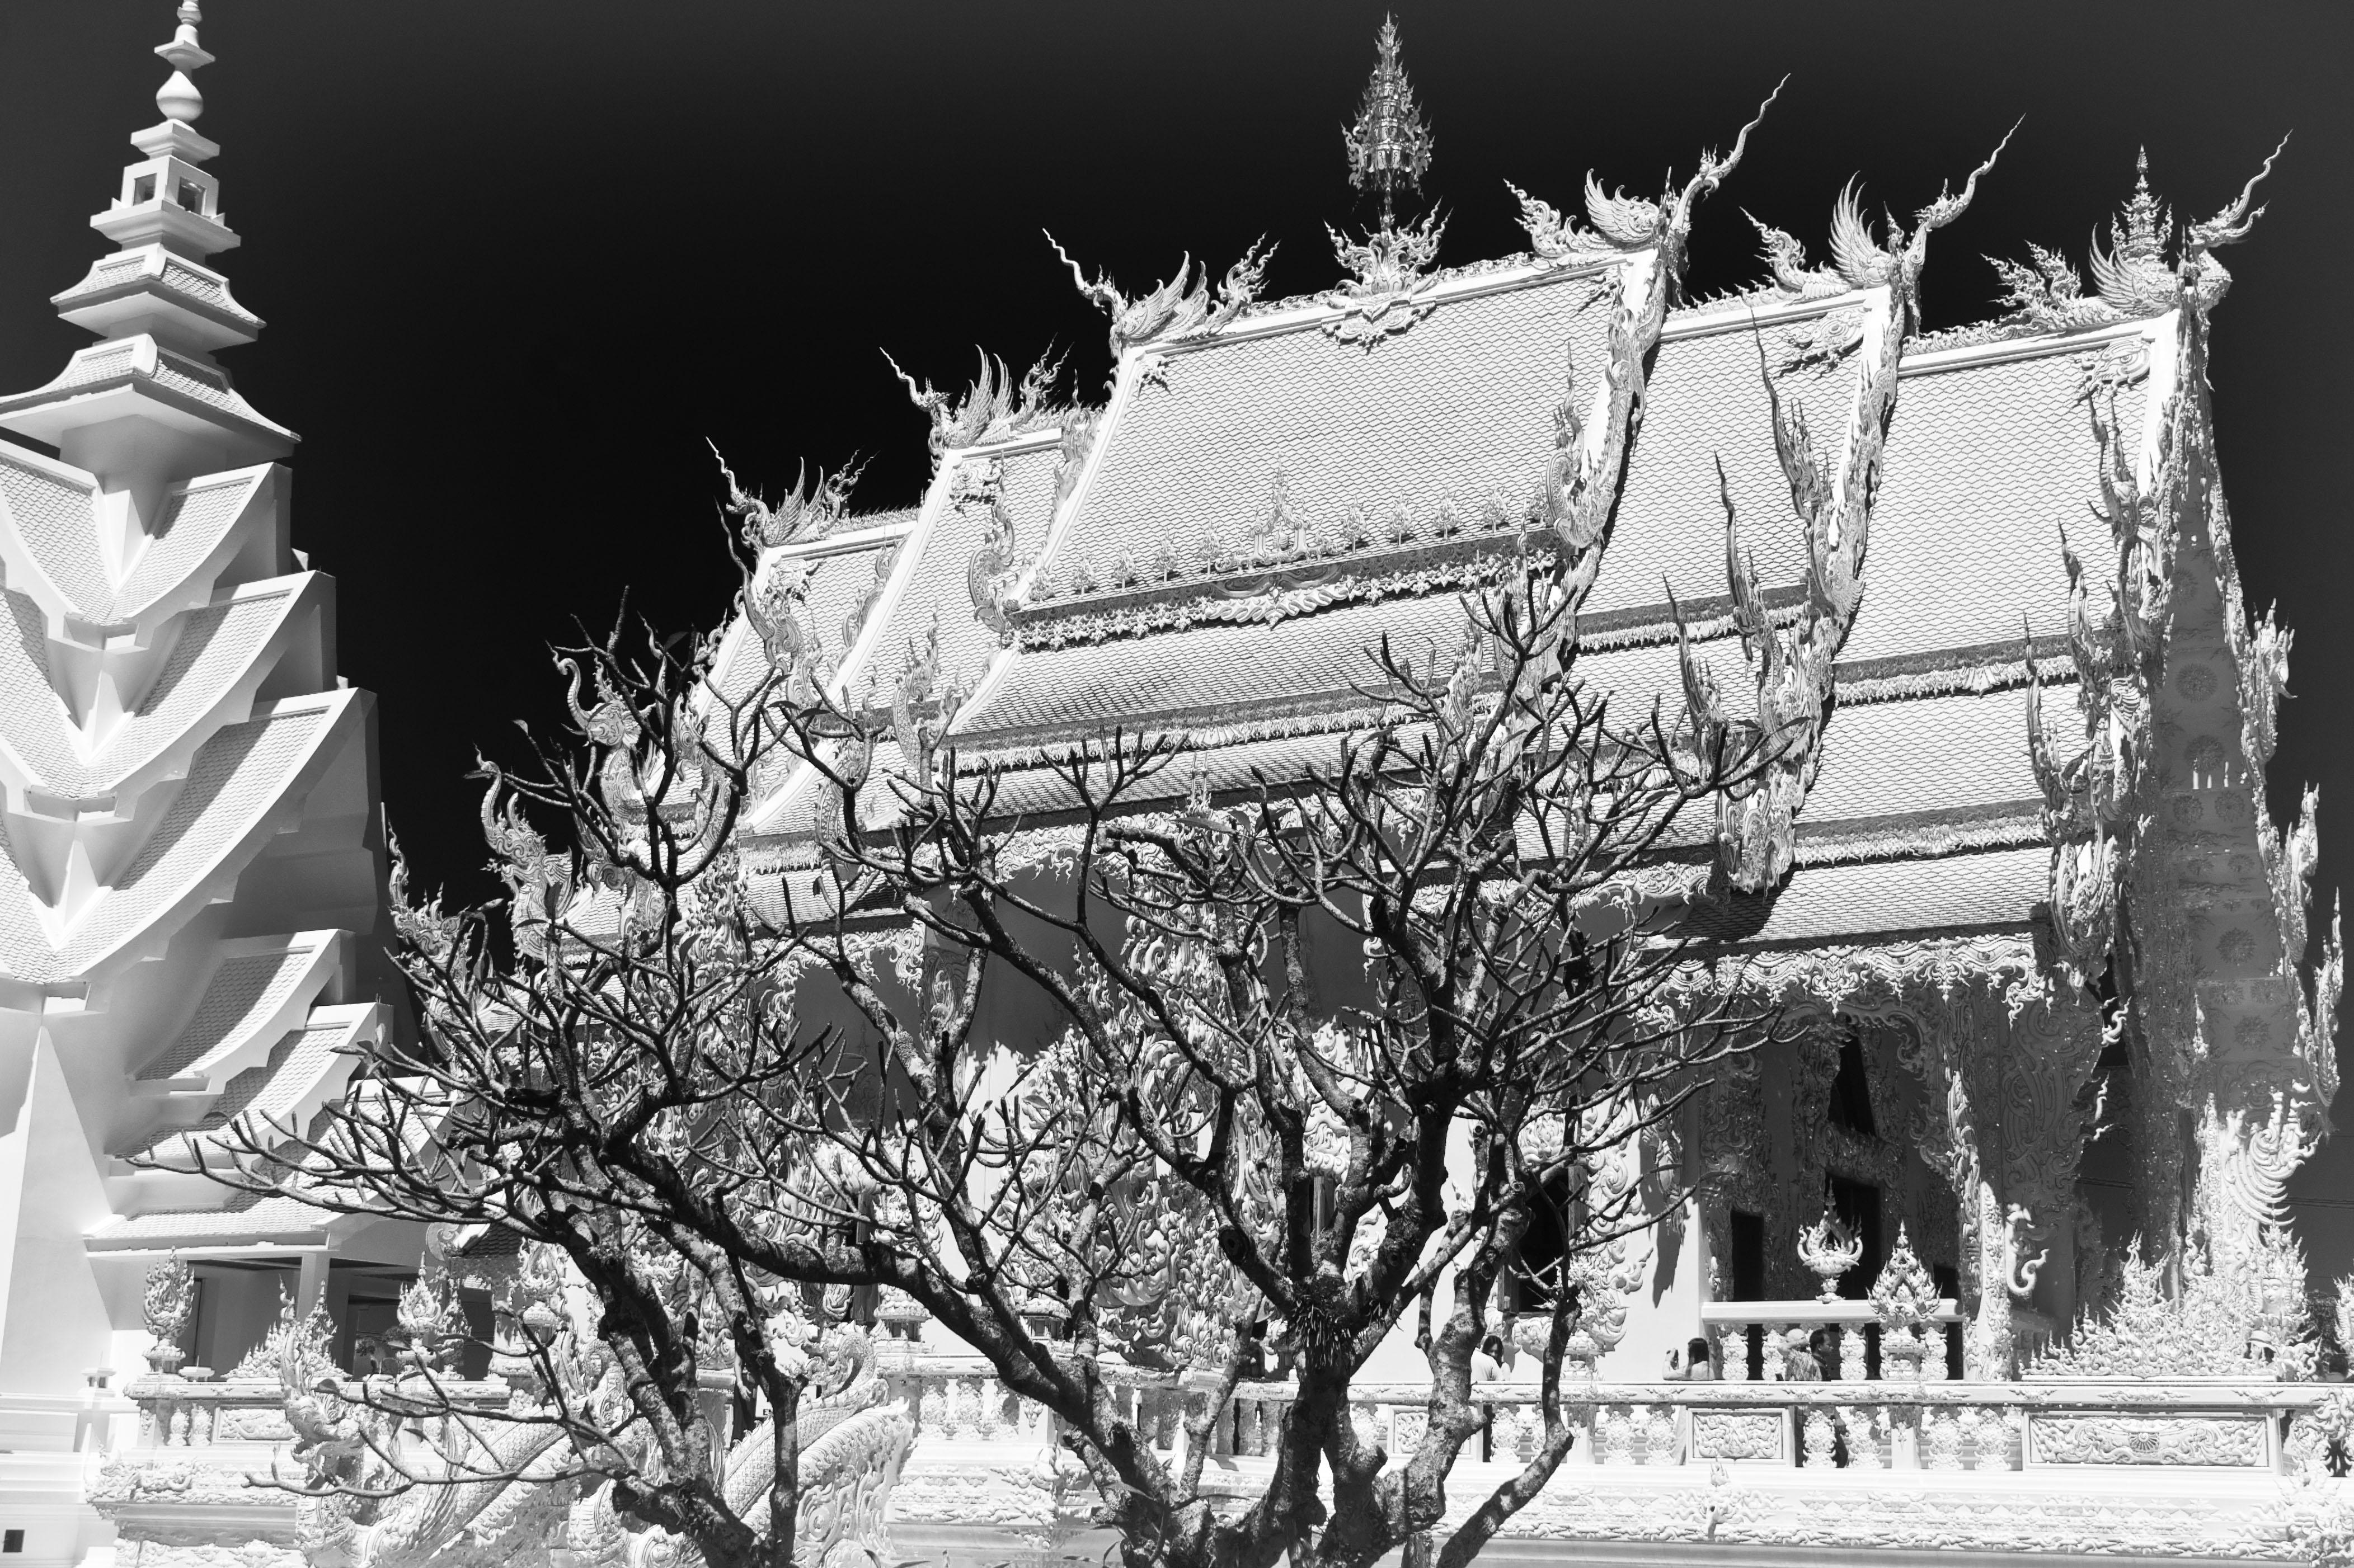 B&W image of White Temple Chiang Rai